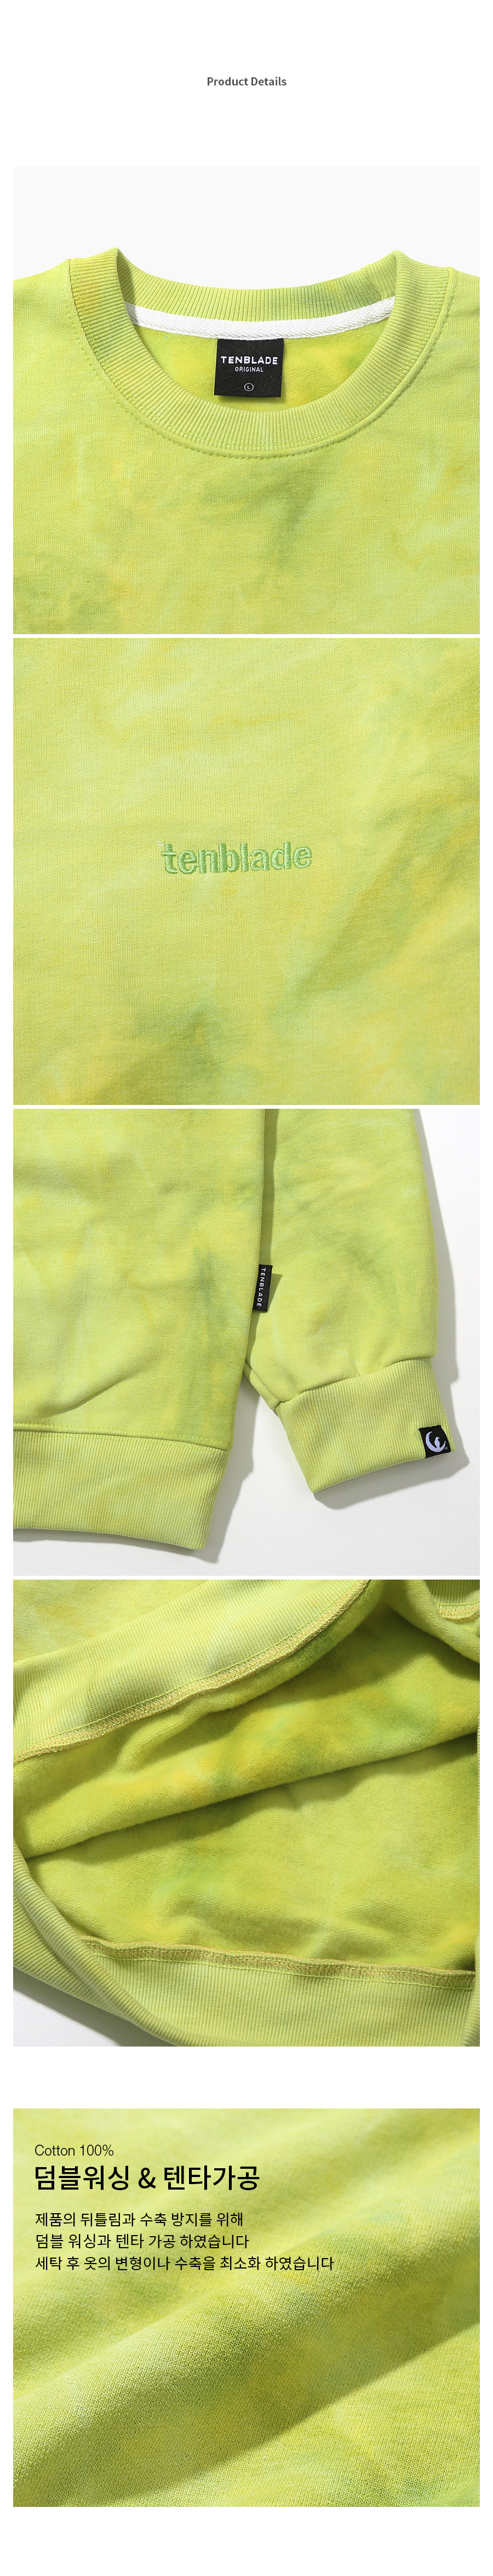 tai270mm-yellow-green-07.jpg